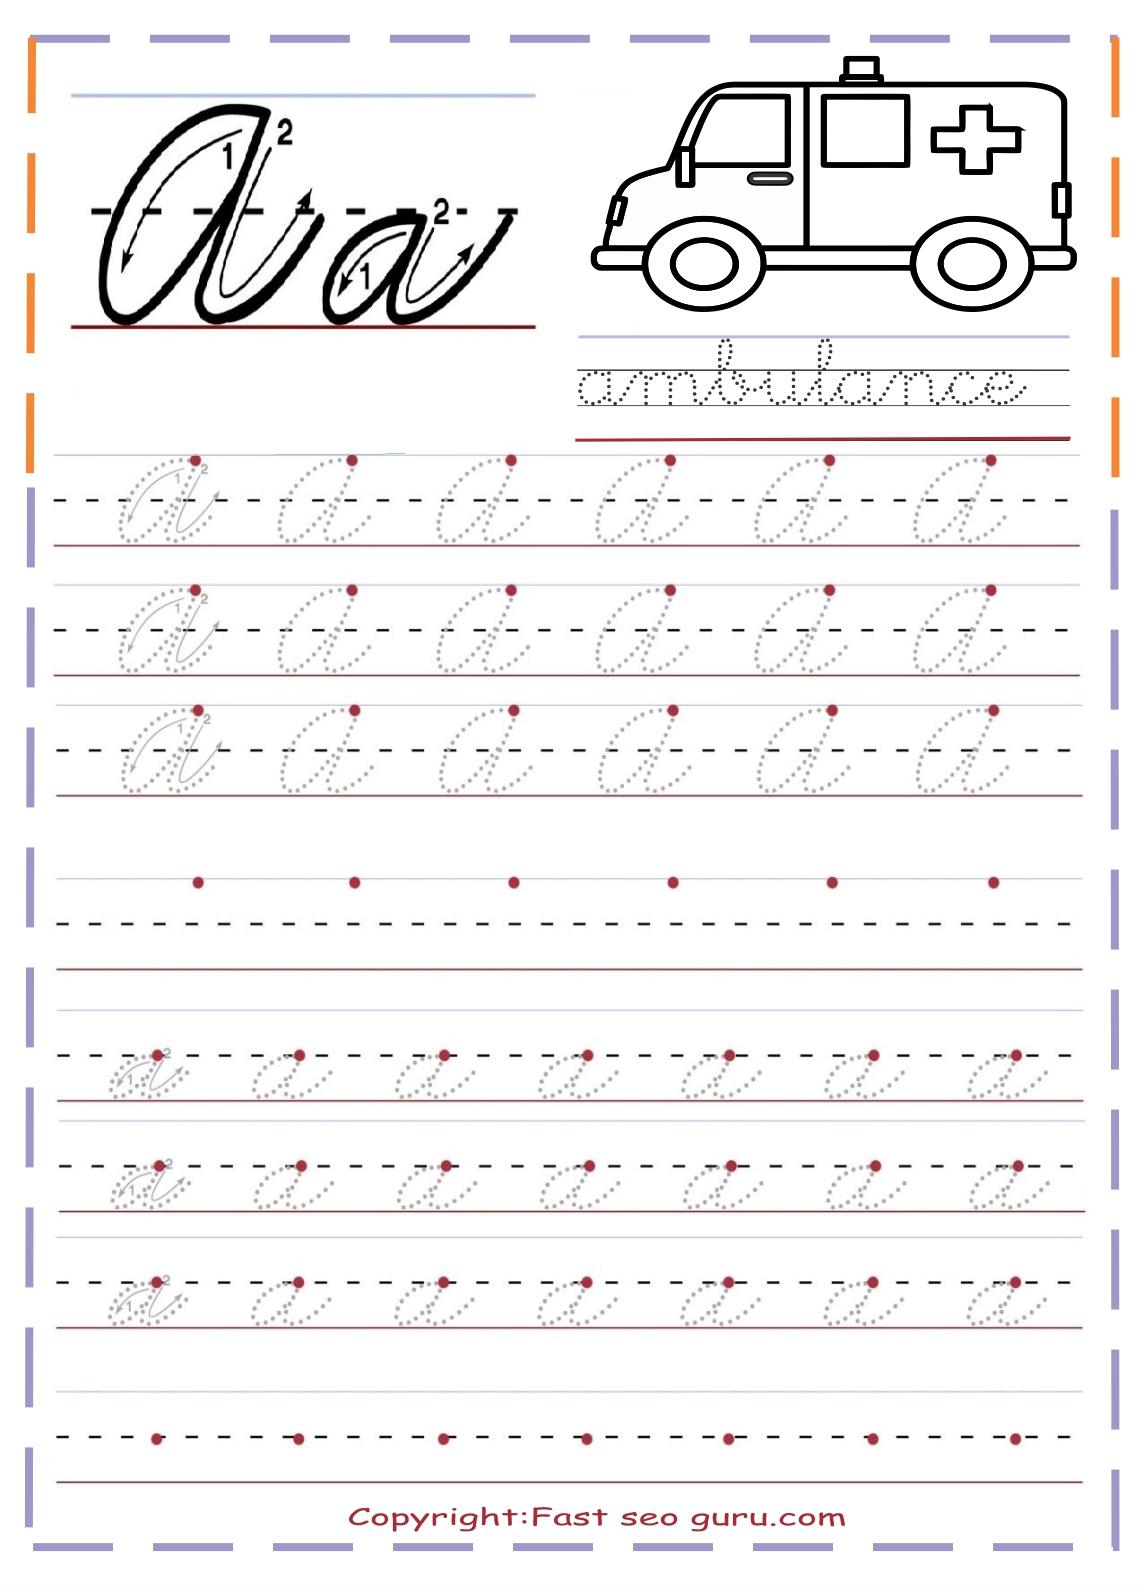 Good Cursive Handwriting Alphabet Lower